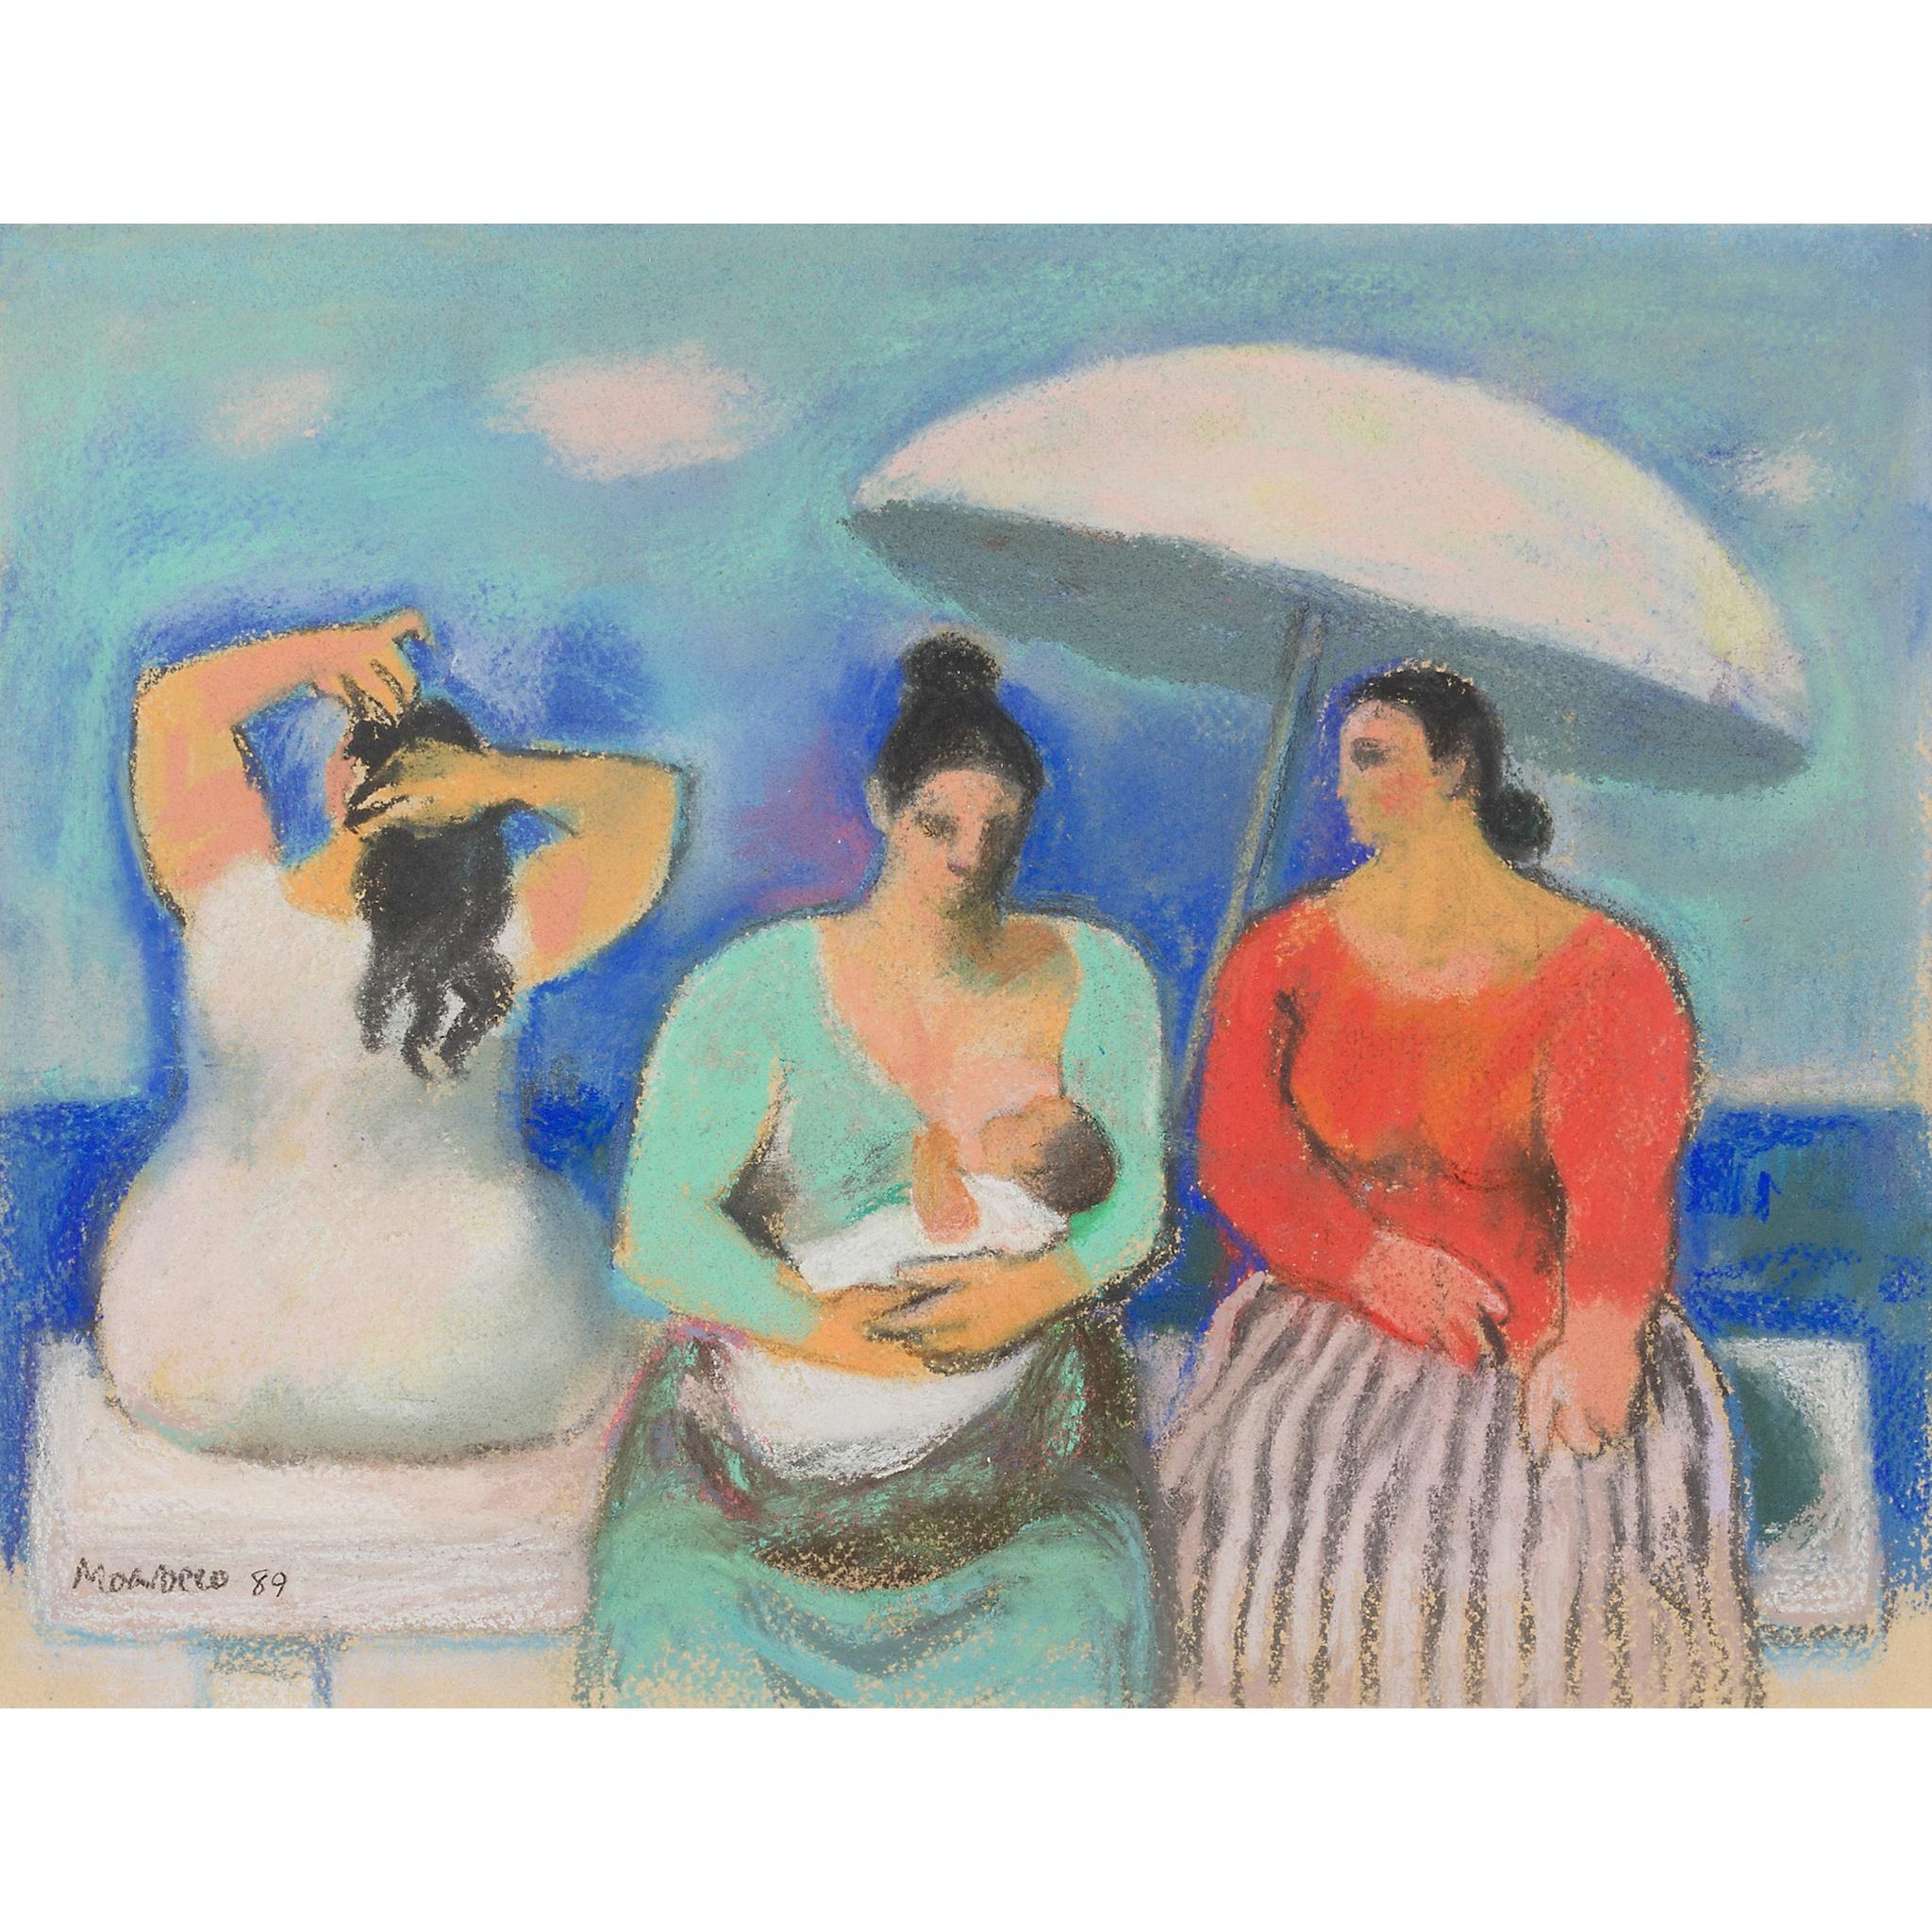 § ALBERTO MORROCCO R.S.A., R.S.W., R.P., R.G.I., L.L.D (SCOTTISH 1917-1999) THREE WOMEN BY THE SEA